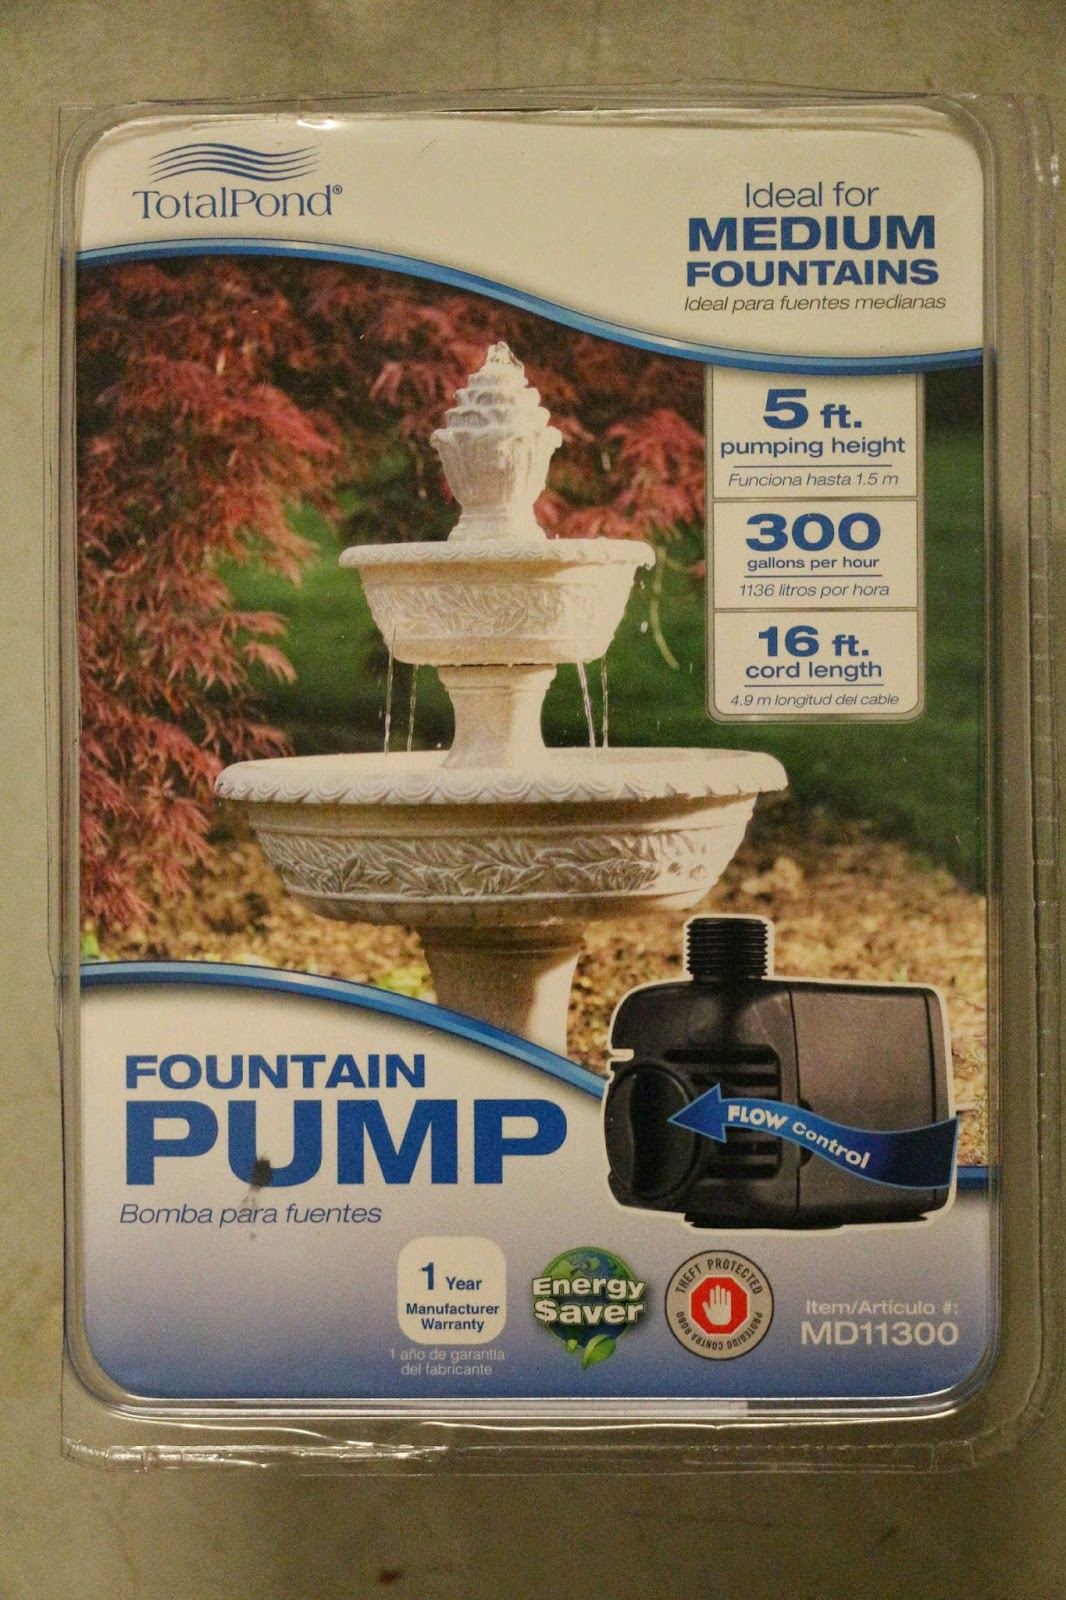 home depot garden fountain pump, fountain pump, home depot fountain pump